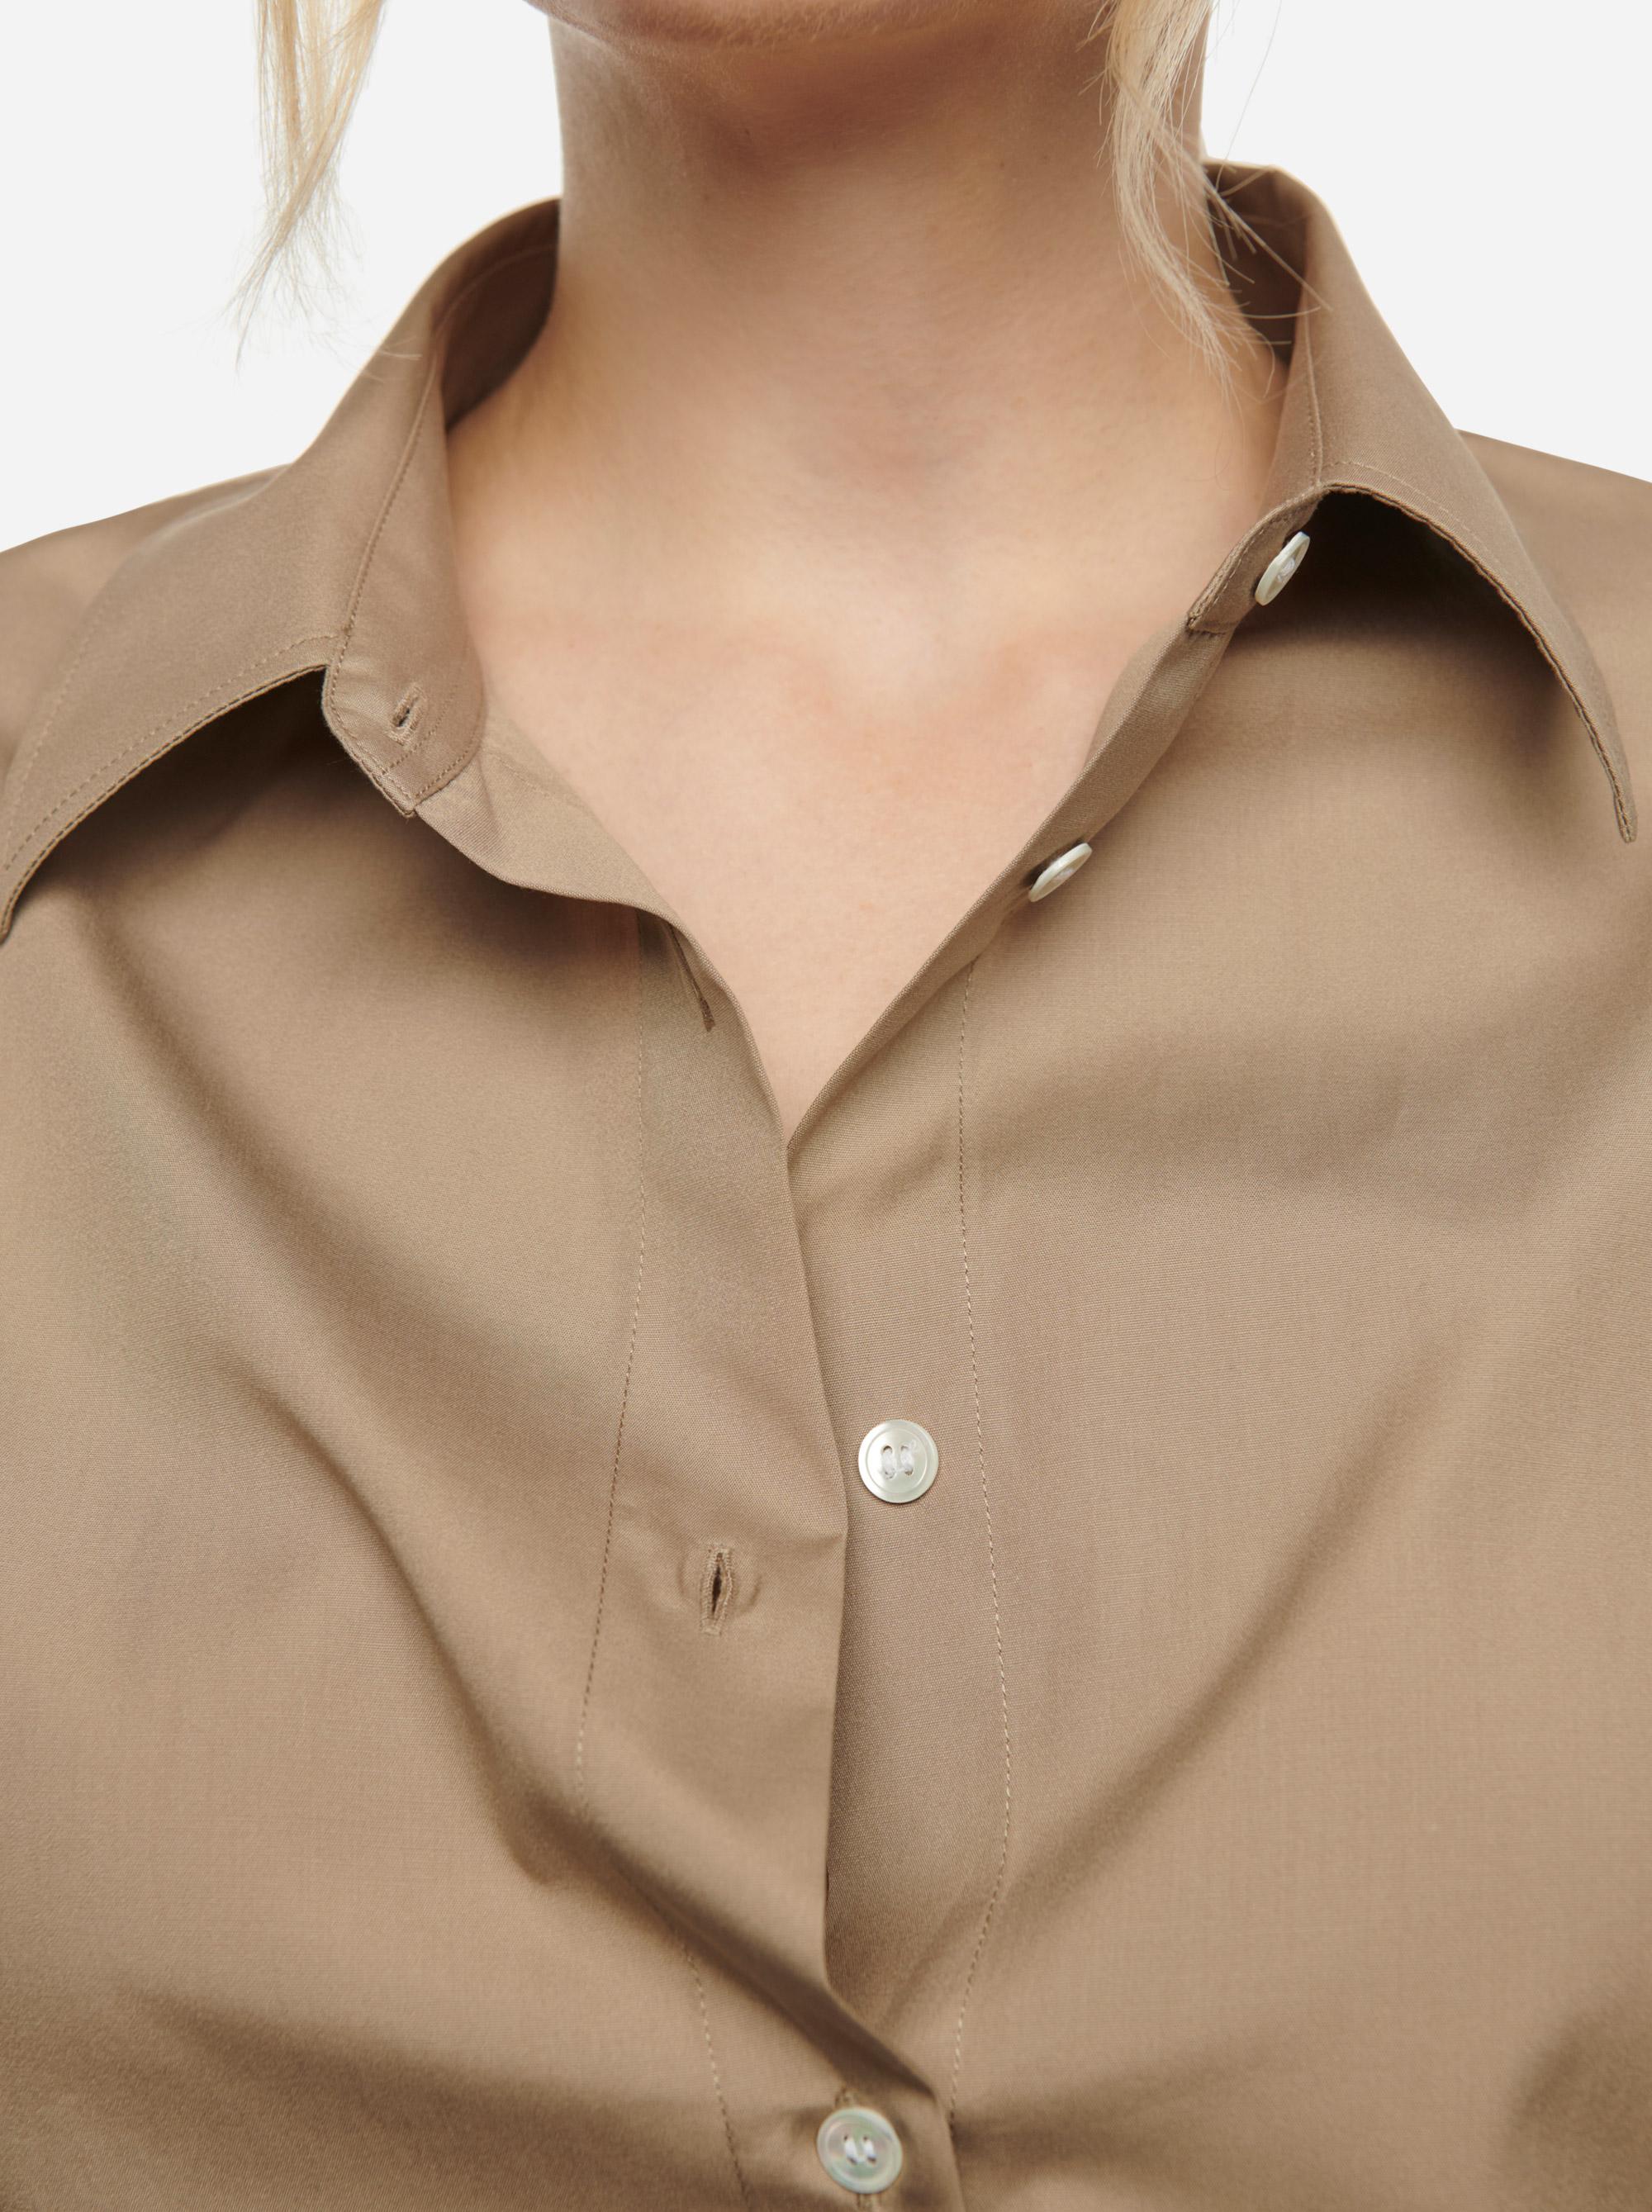 Teym-Shirt-Beige_women-4